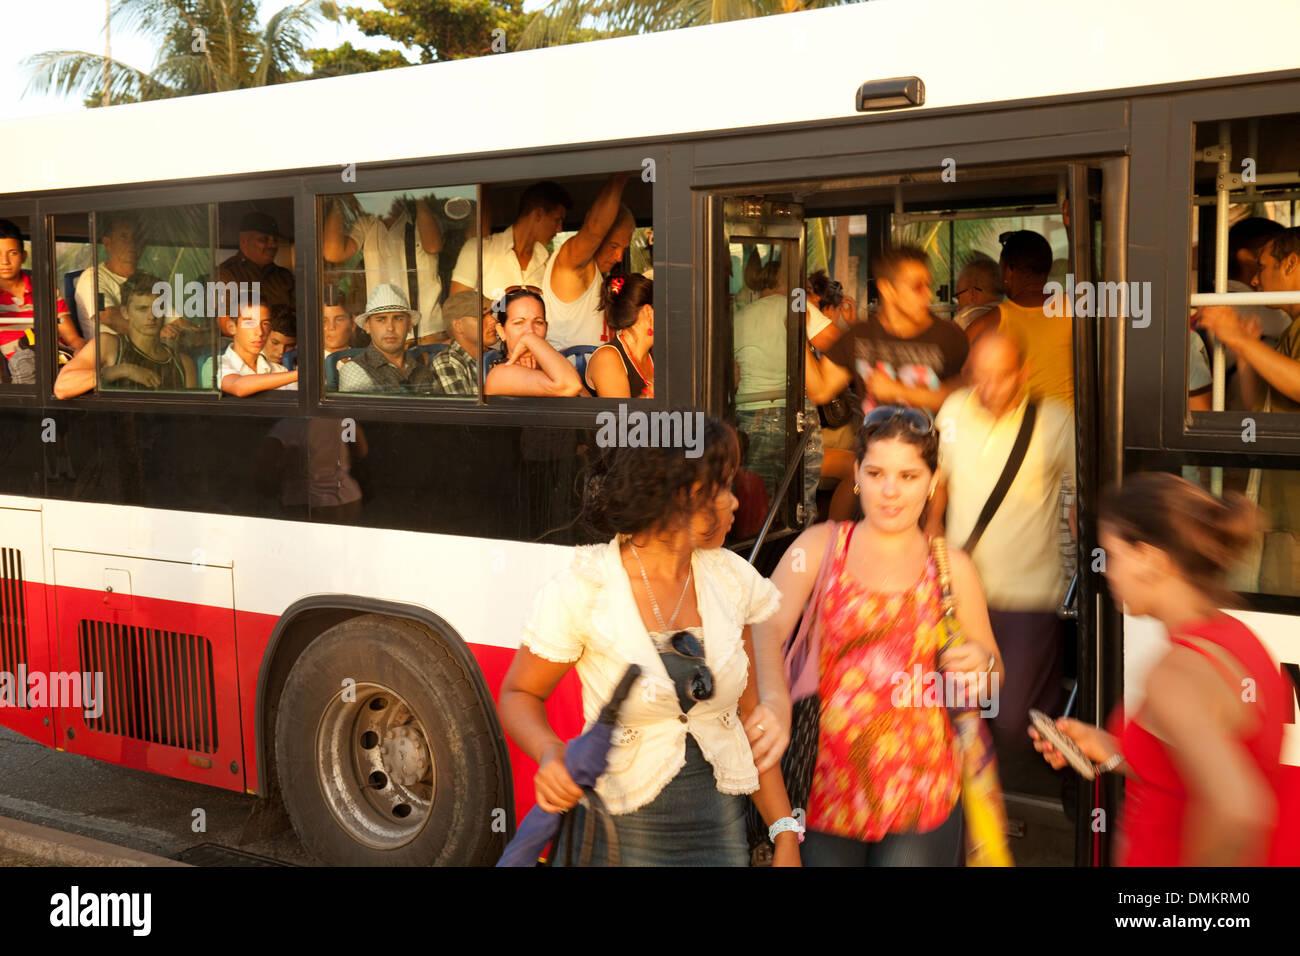 Local cuban people on a bus - example of public transport, Cienfuegos, Cuba, caribbean - Stock Image